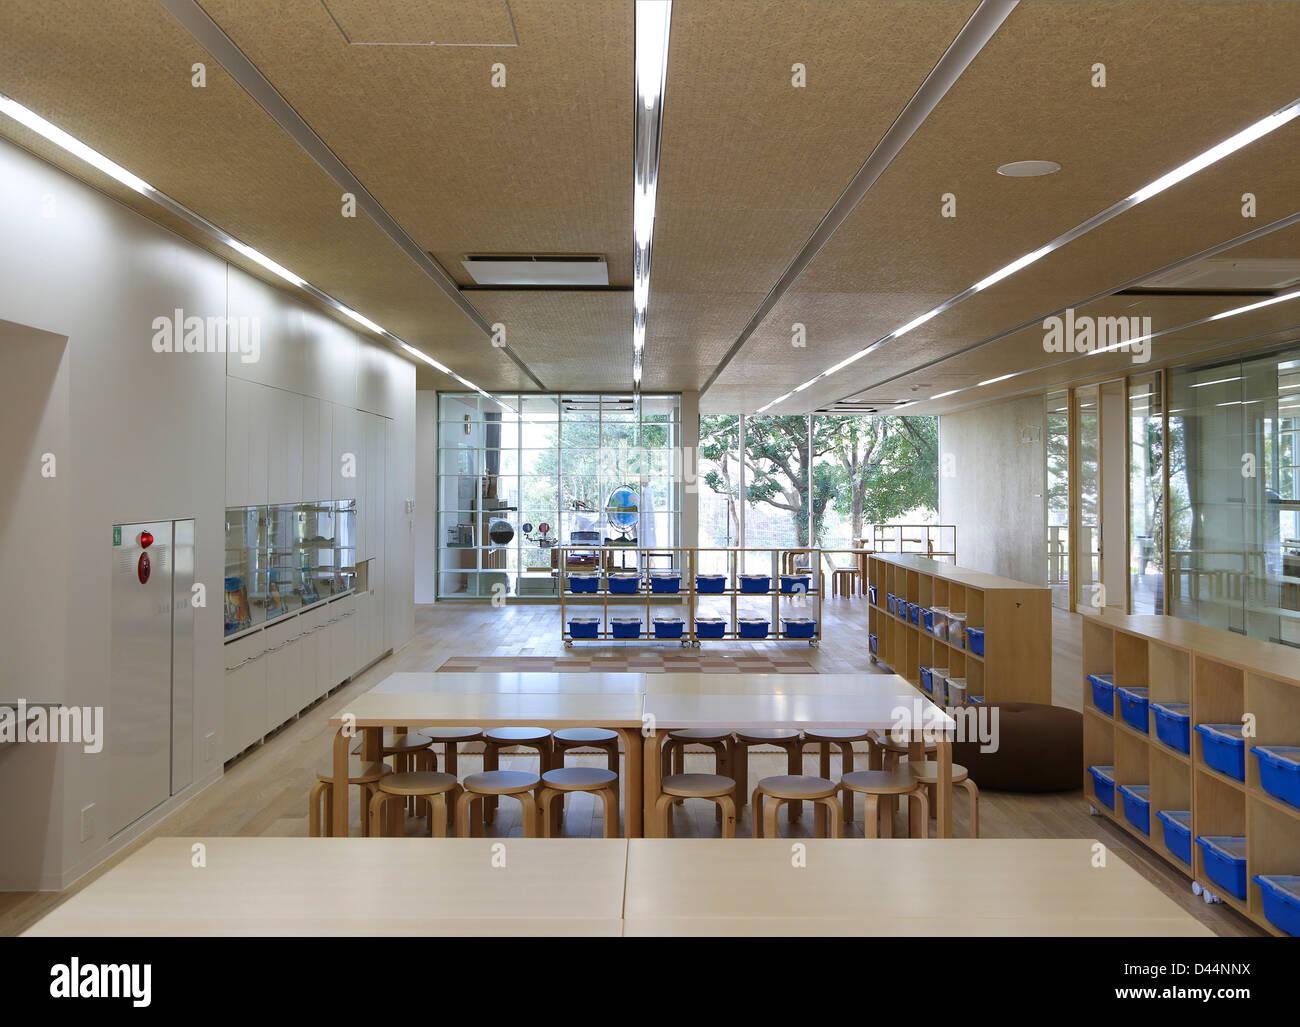 Teikyo University Elementary School Tokyo Japan Architect Kengo Kuma 2012 Interior View Typical Classroom On Top Floor